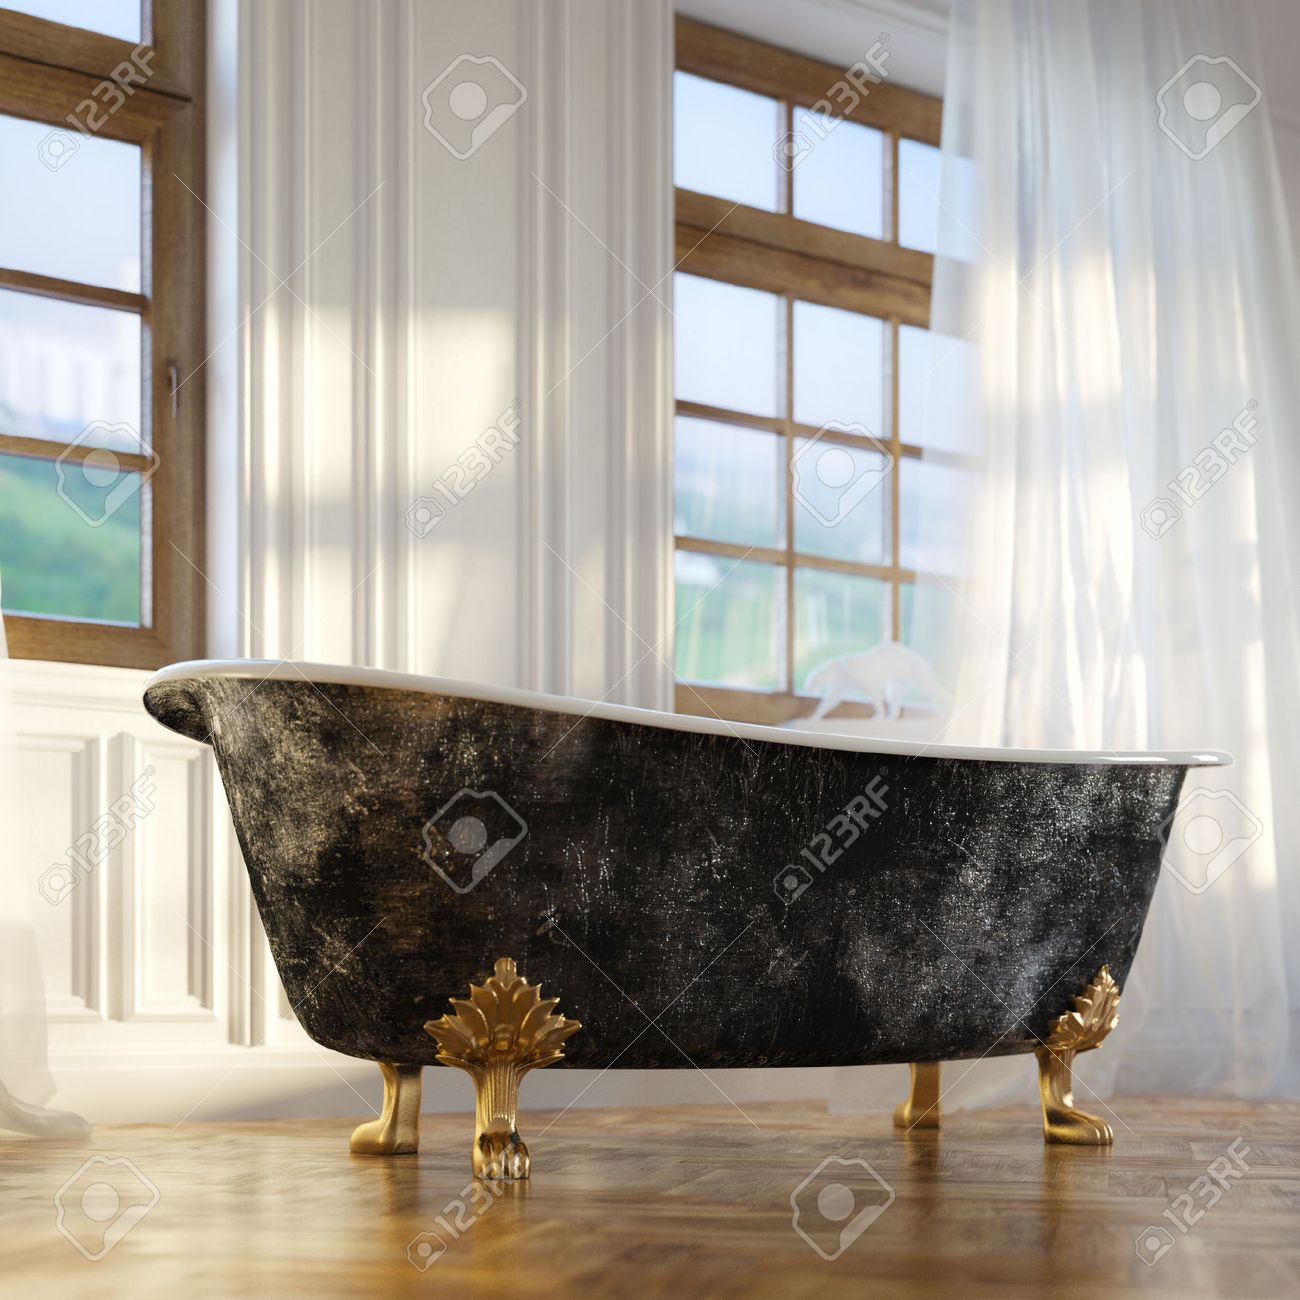 Luxury Retro Bathtub In Modern Room Interior 2d Version - 25203191